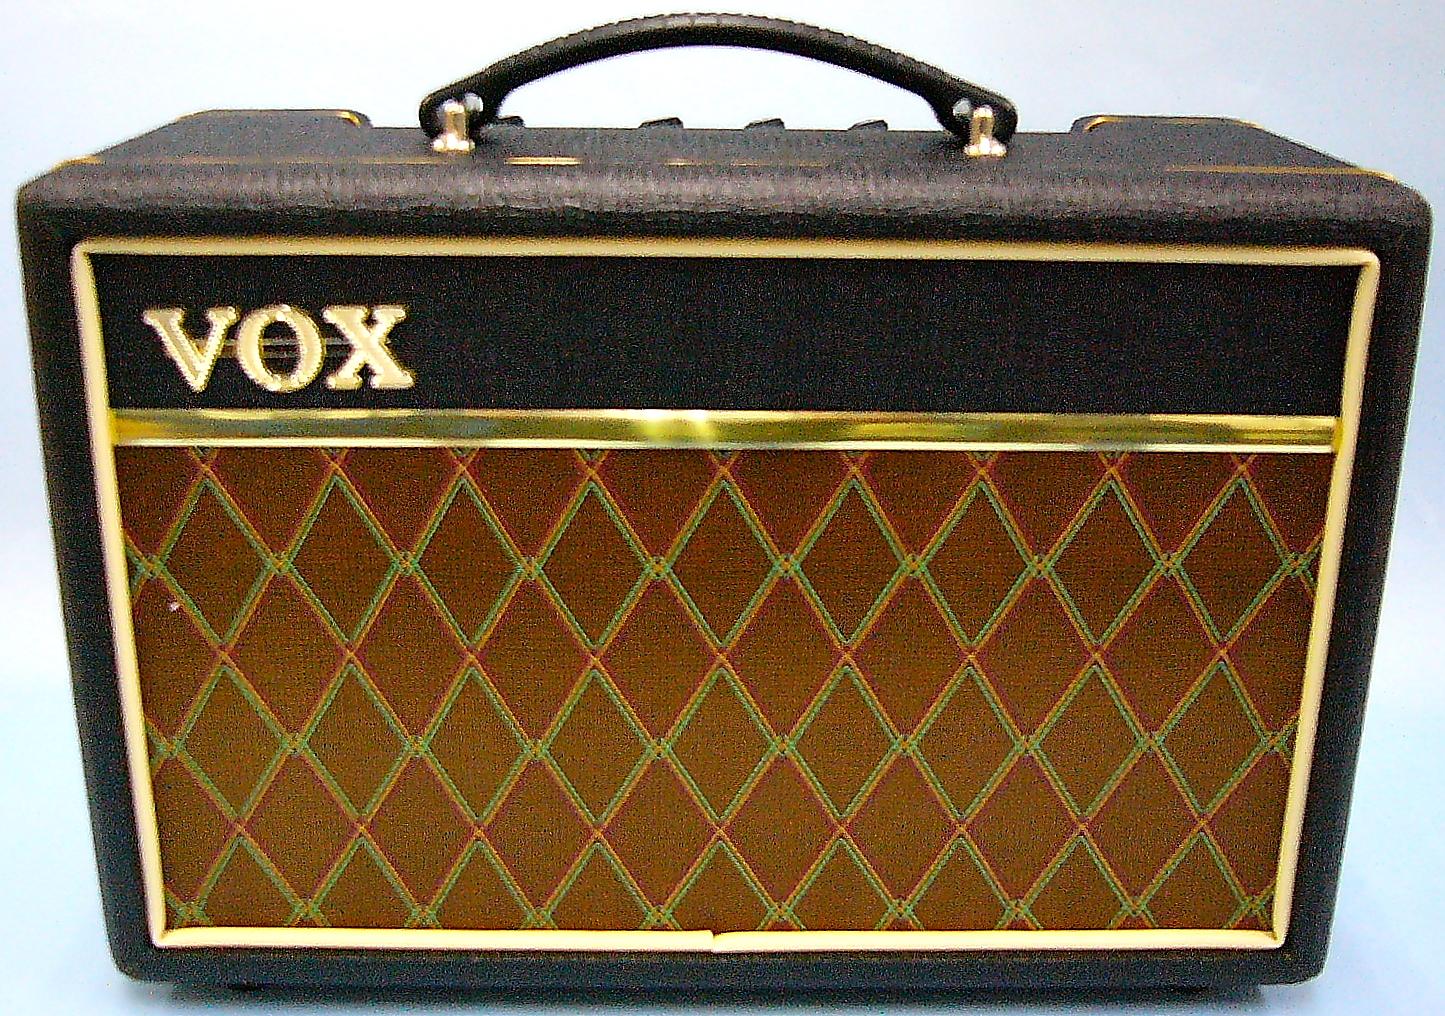 VOX ギターアンプ Pathfinder 10